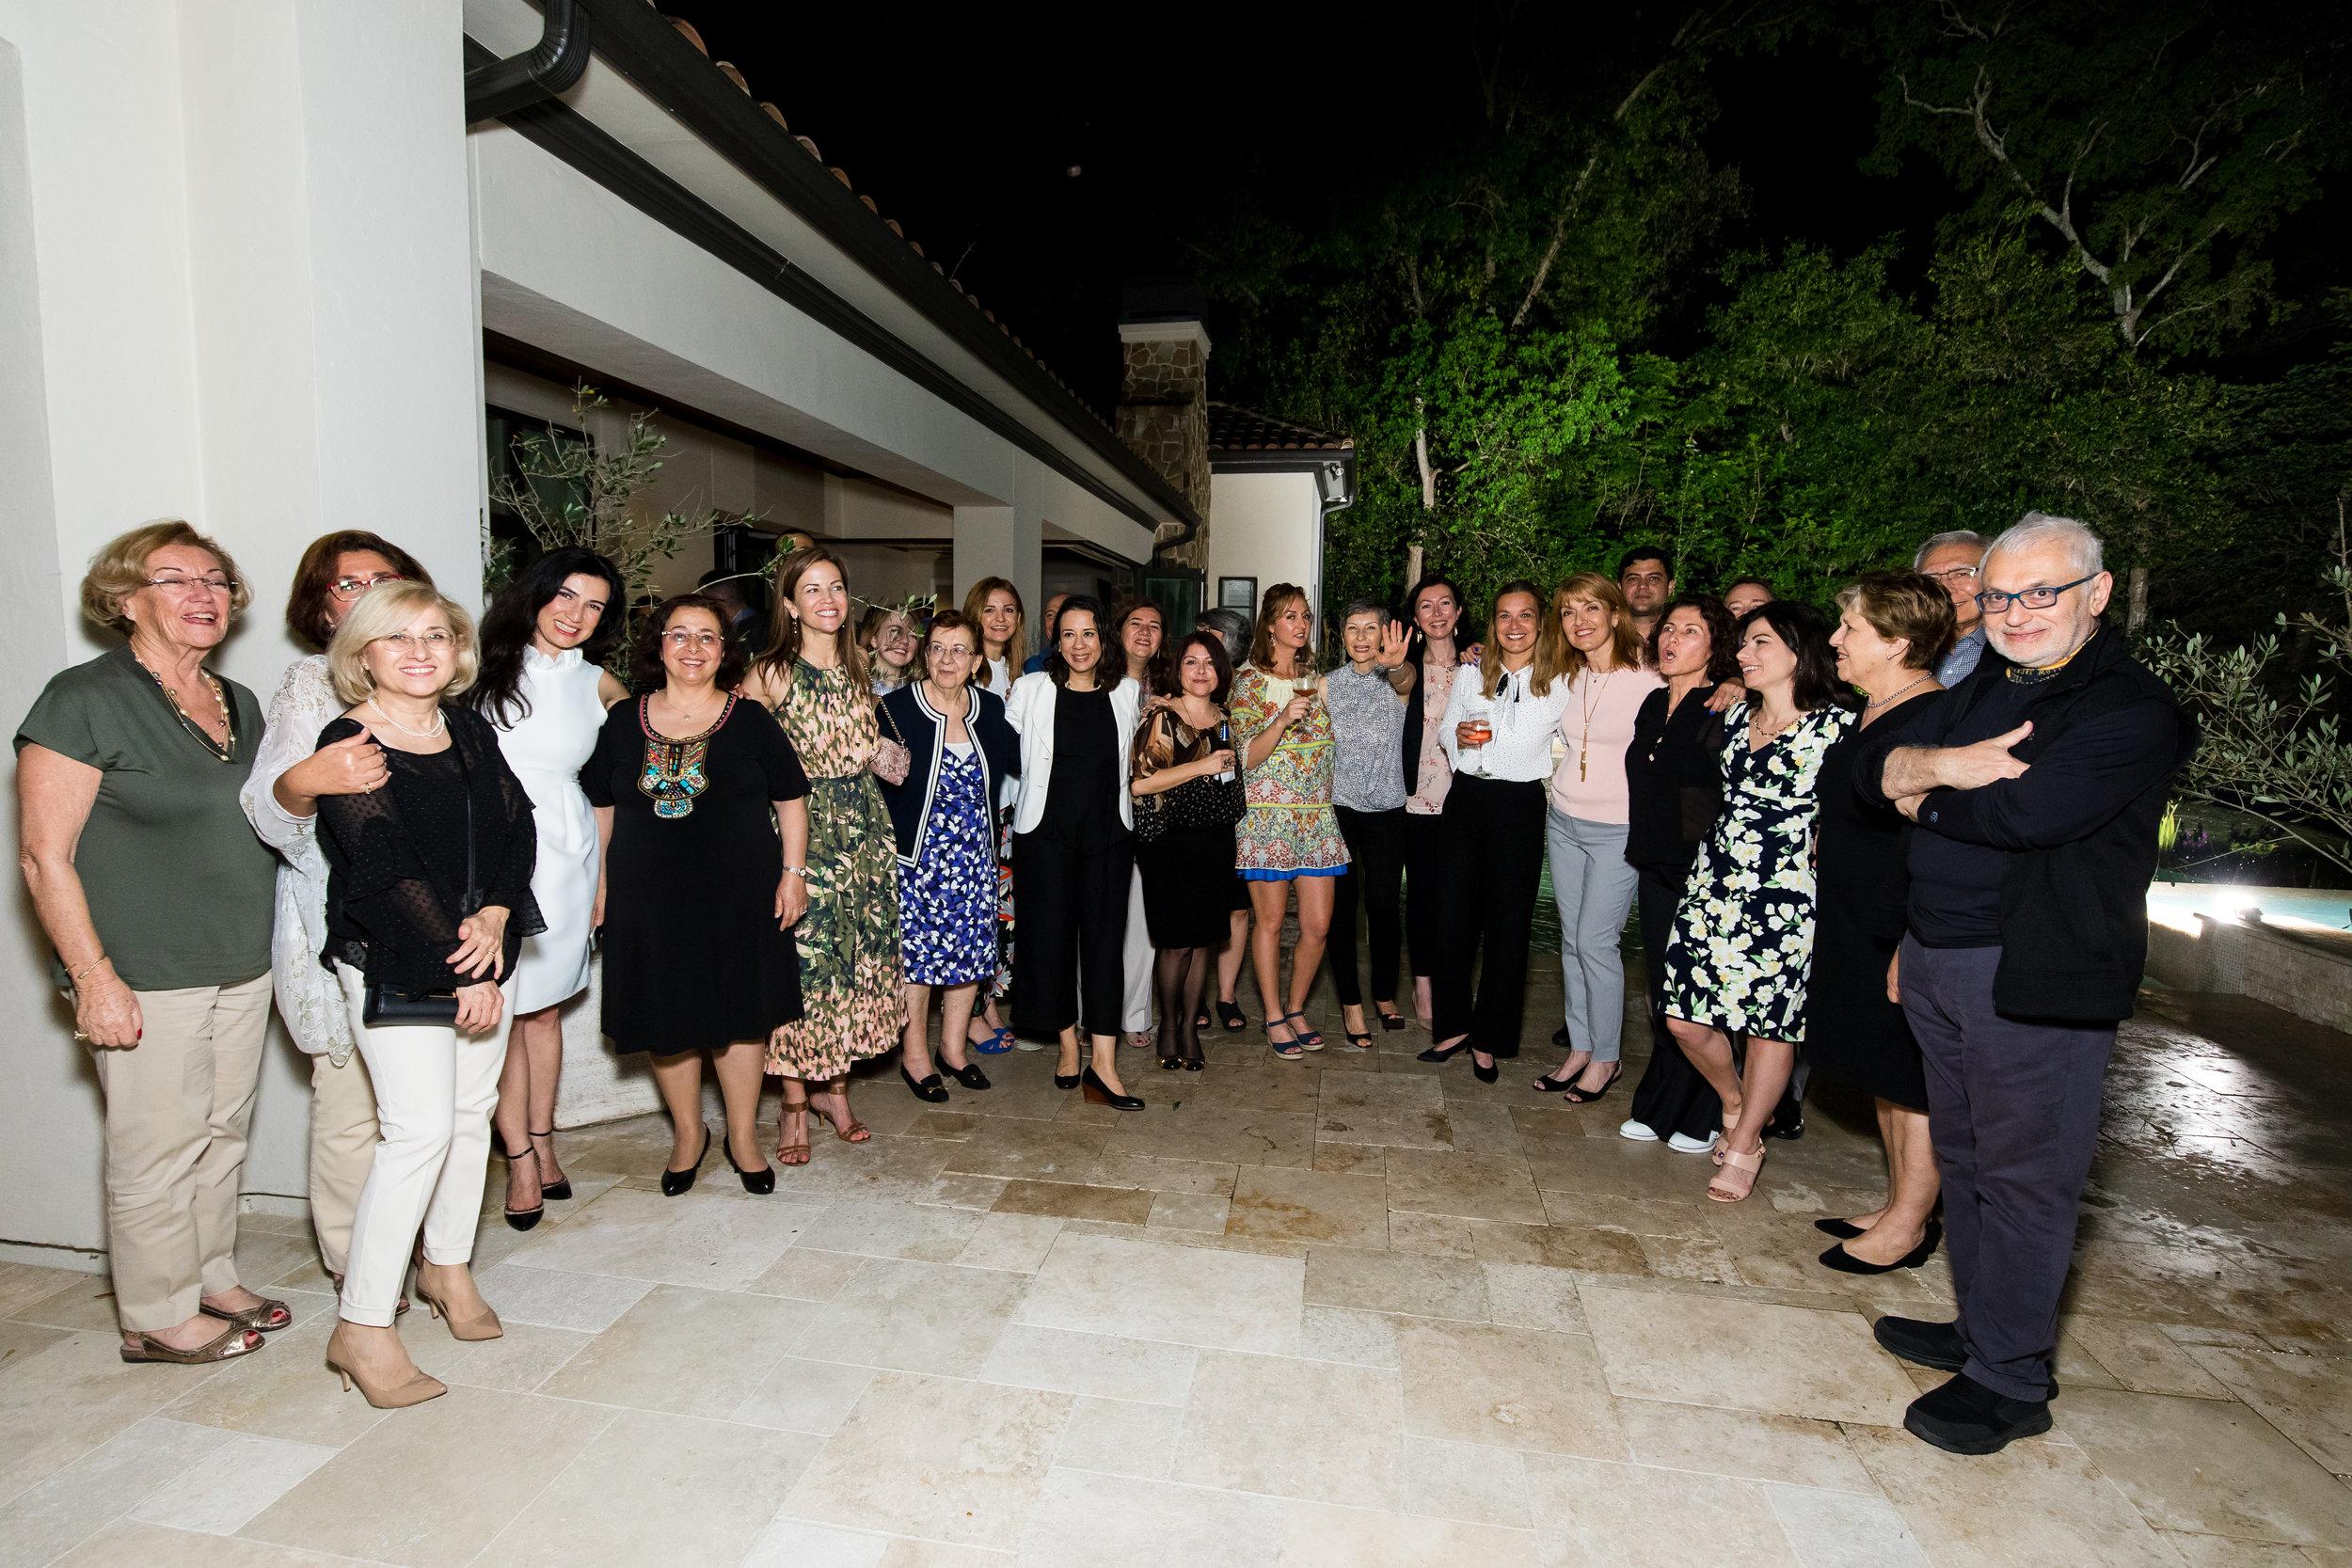 20180421-3rd Annual Education Women Turkey-385.jpg